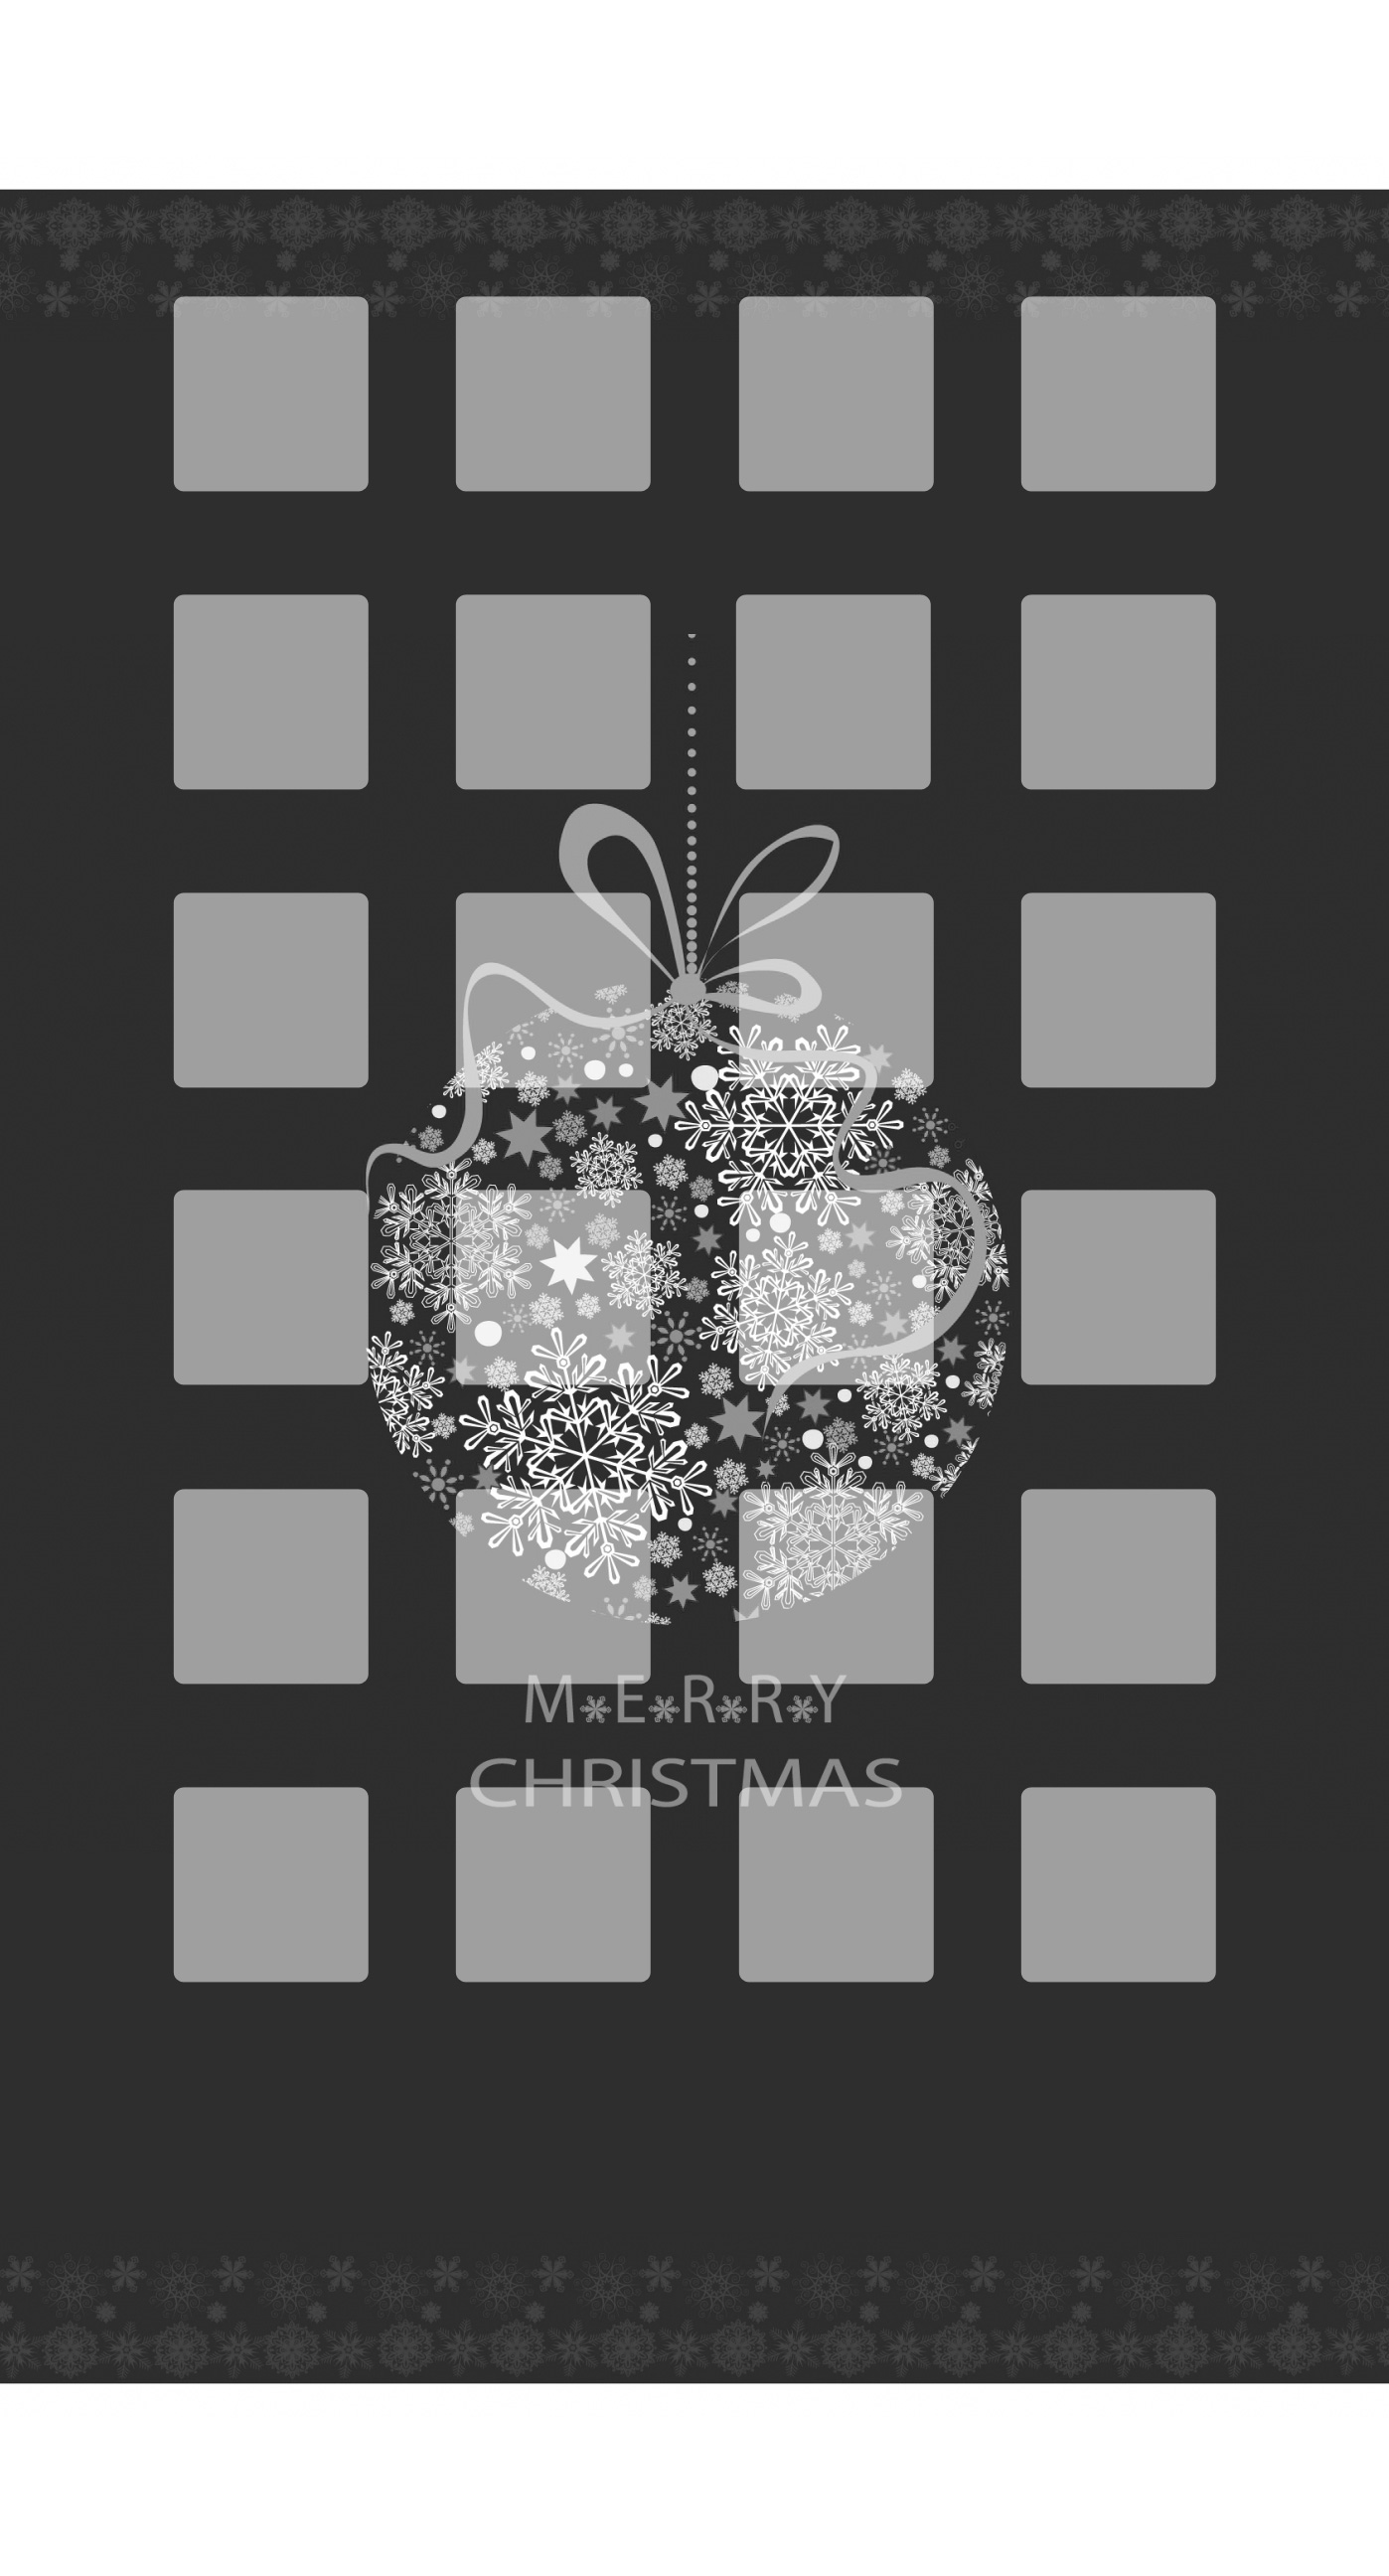 Shelf Black Christmas Women Wallpaper Sc Iphone7plus